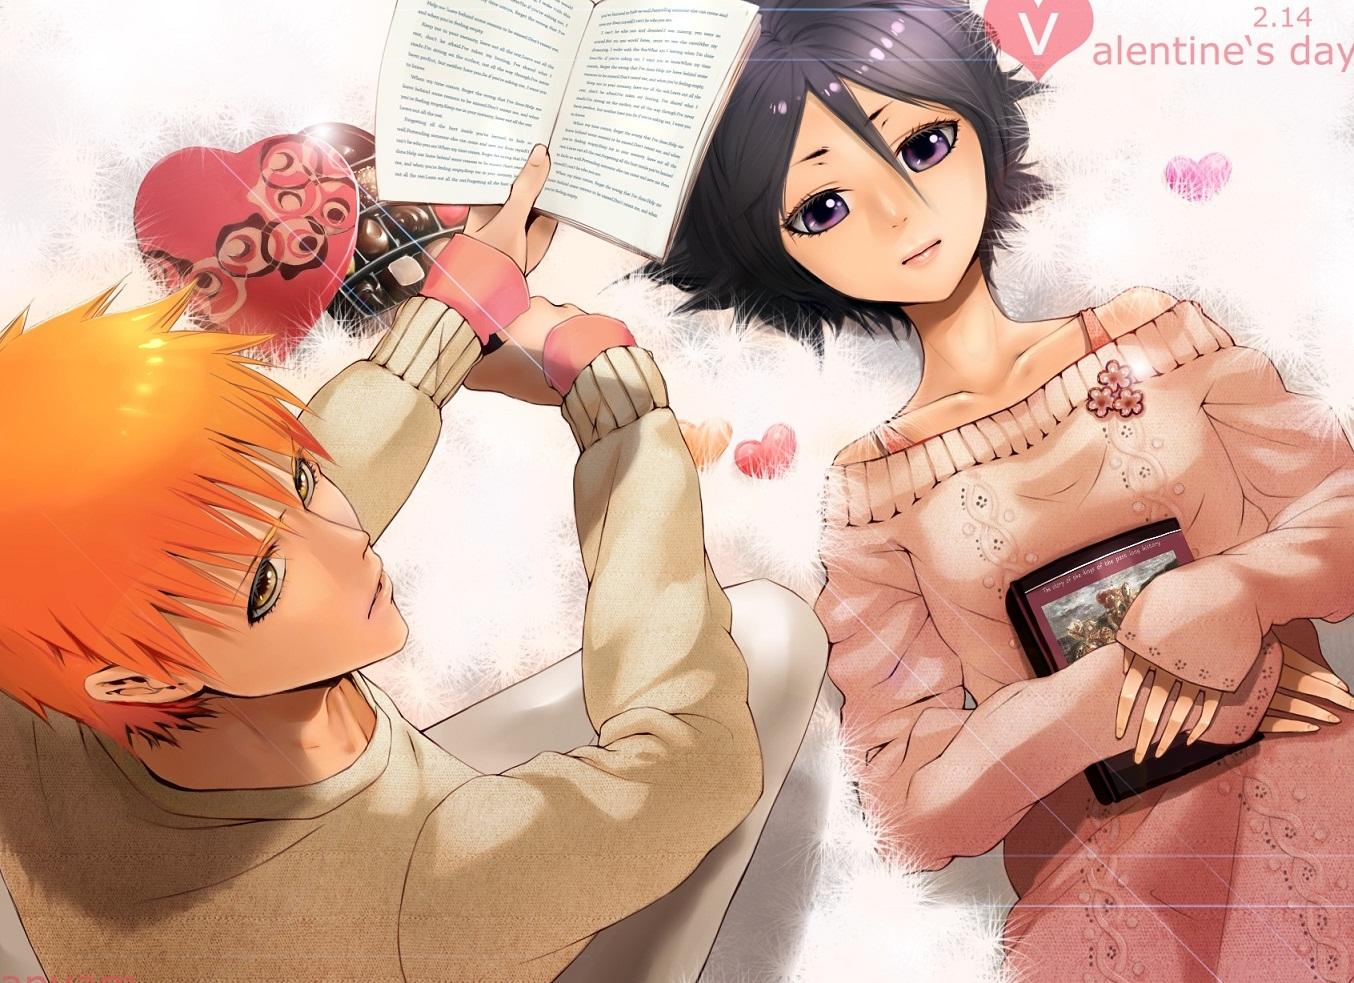 http://2.bp.blogspot.com/-yvcLeZNCImA/UOoZ3Cz6YJI/AAAAAAAAU2A/JNMj0wXg_BY/s1600/anime+bleach+st.+valentines+day+rukia+and+ichigo+wallpaper+5+stars+phistars.jpg